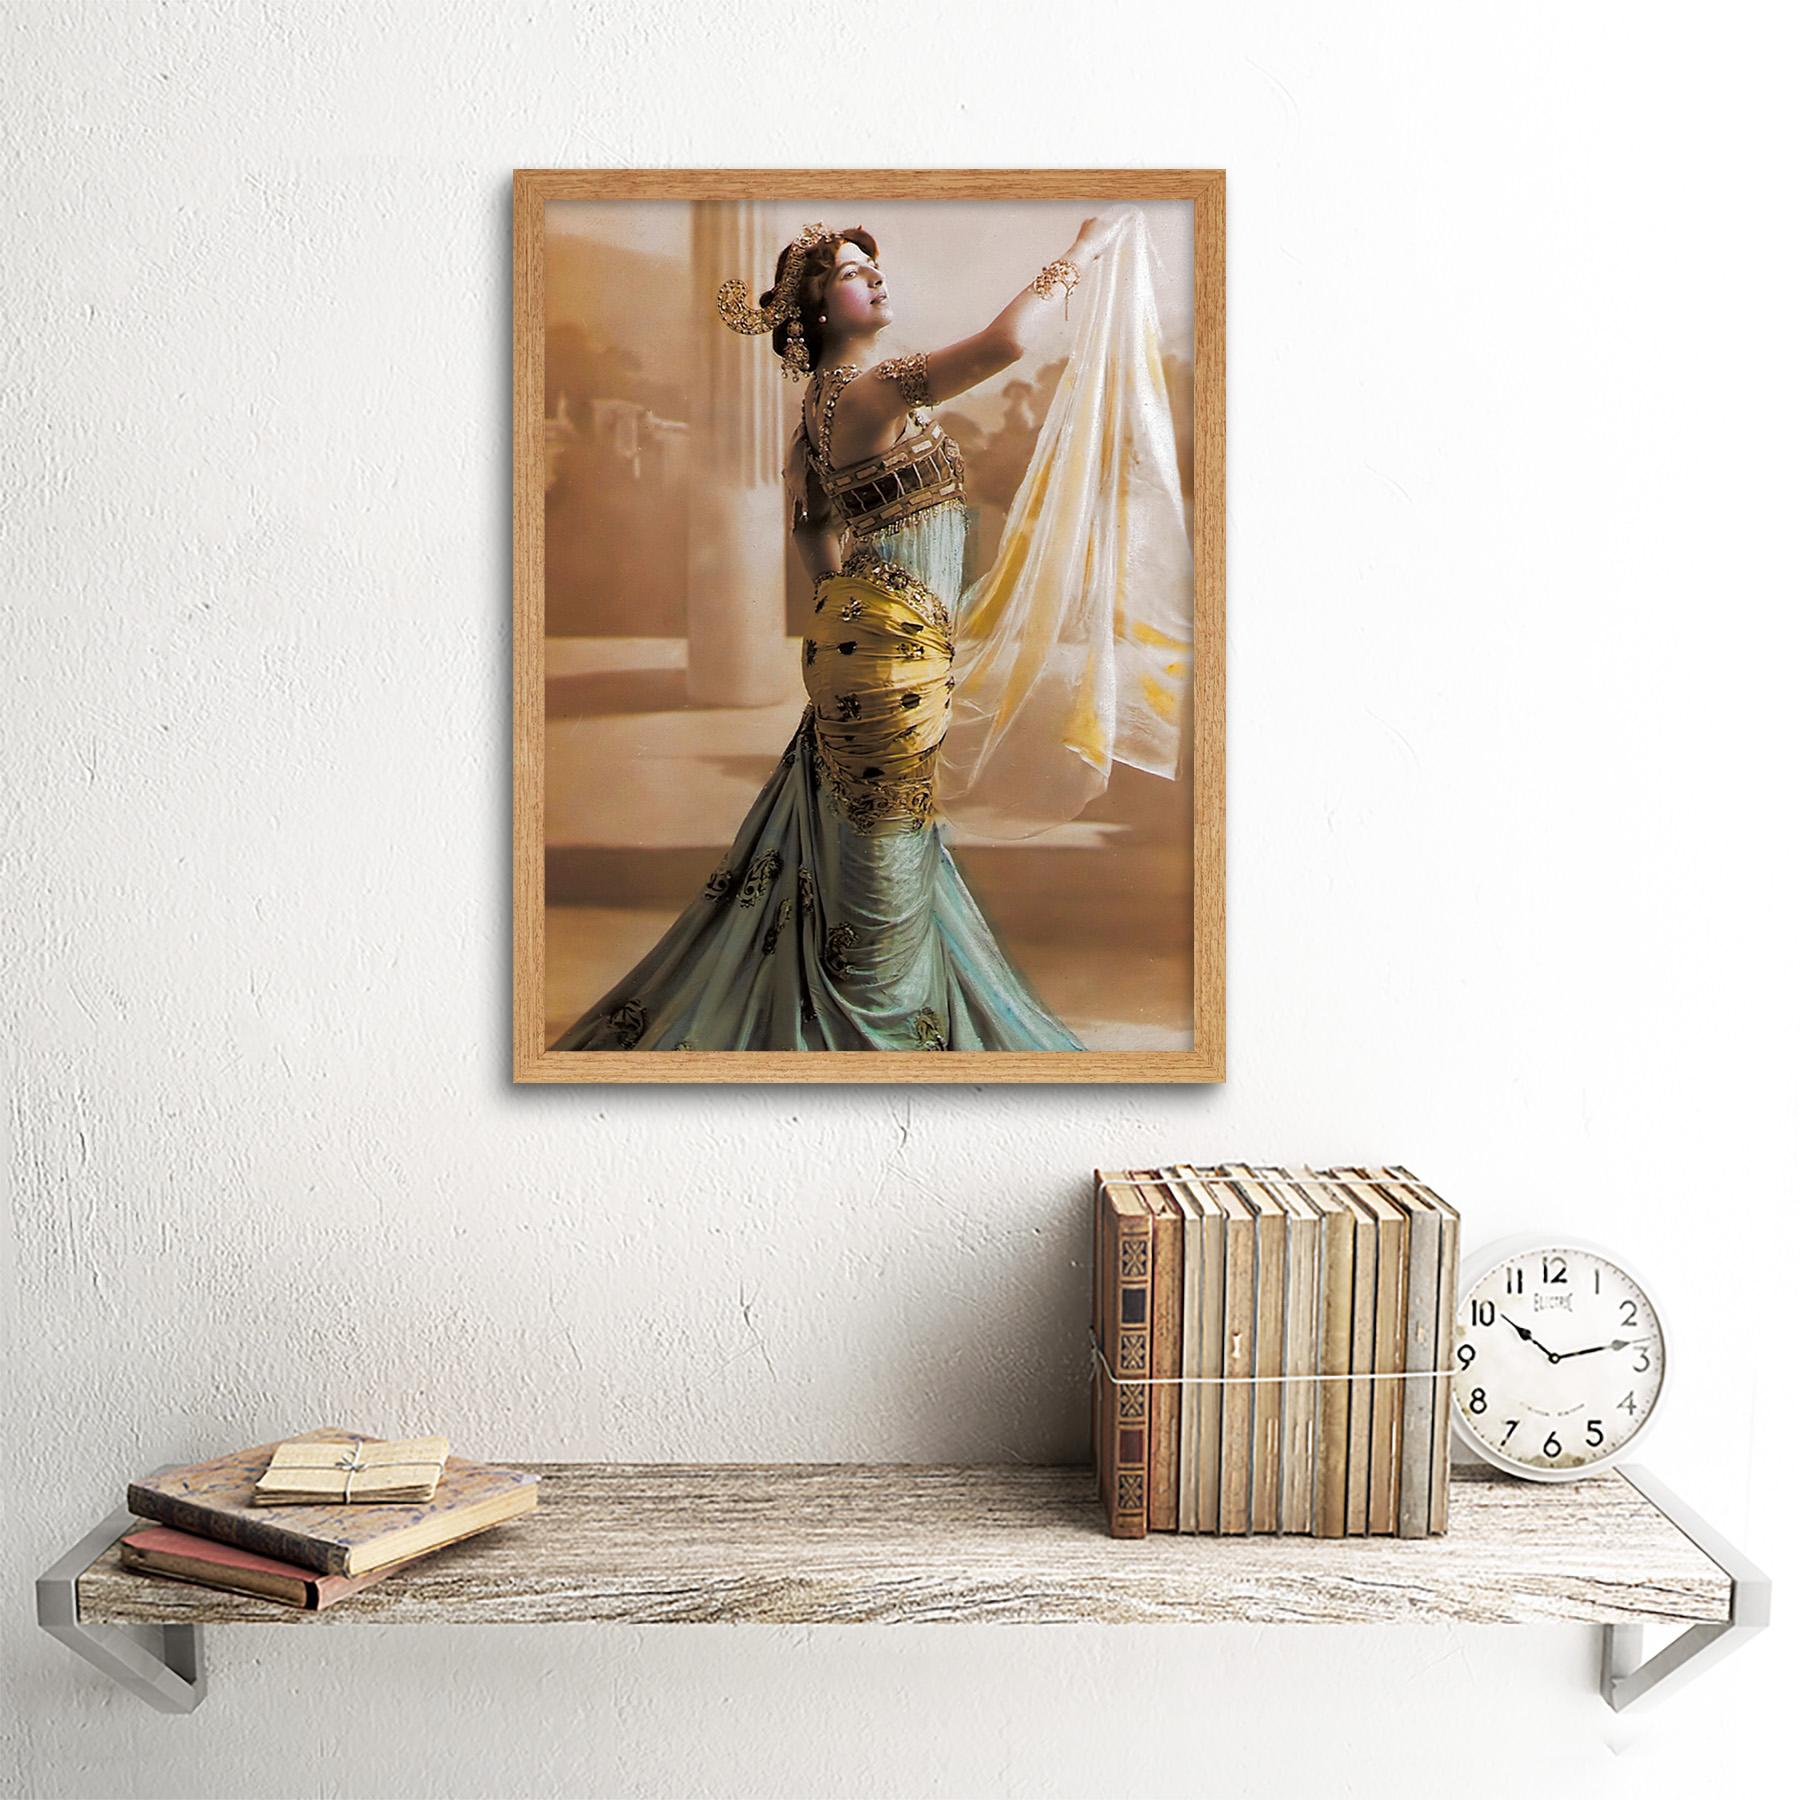 Hand-Coloured-Portrait-Dancer-Spy-Mata-Hari-Photo-Framed-Wall-Art-Poster thumbnail 13